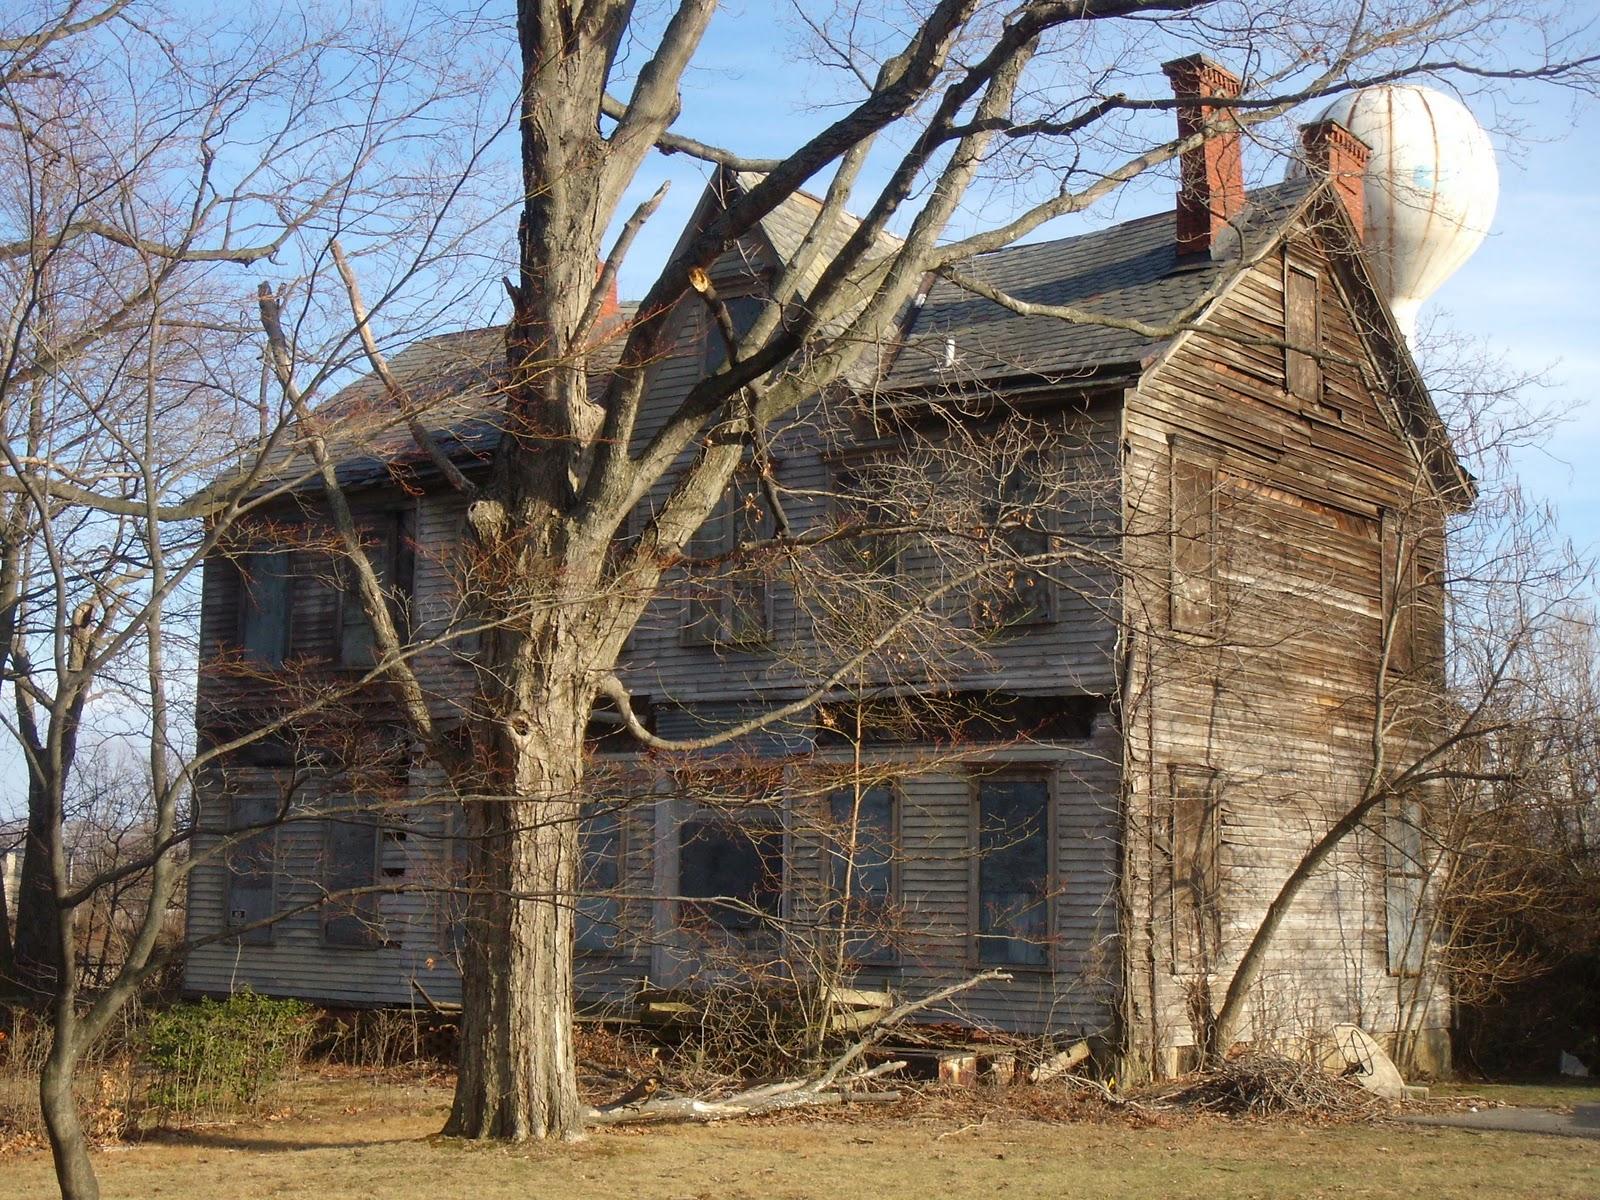 Aberdeen NJ Life: Abandoned House on Cliffwood Avenue